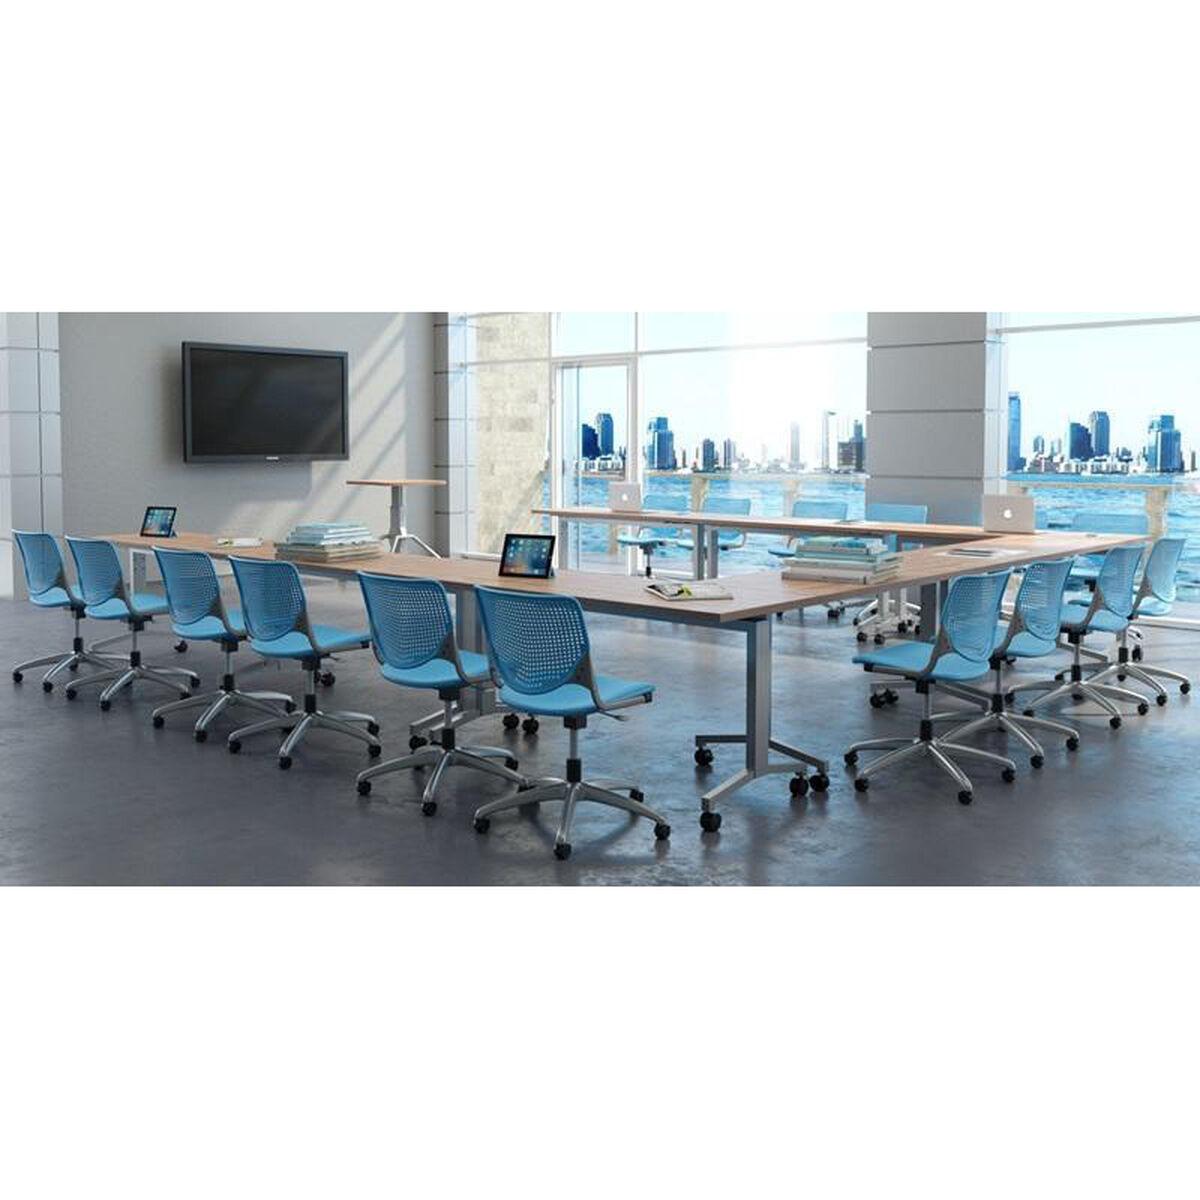 KOOL Task Chair Black TK2300-P10 | Bizchair.com